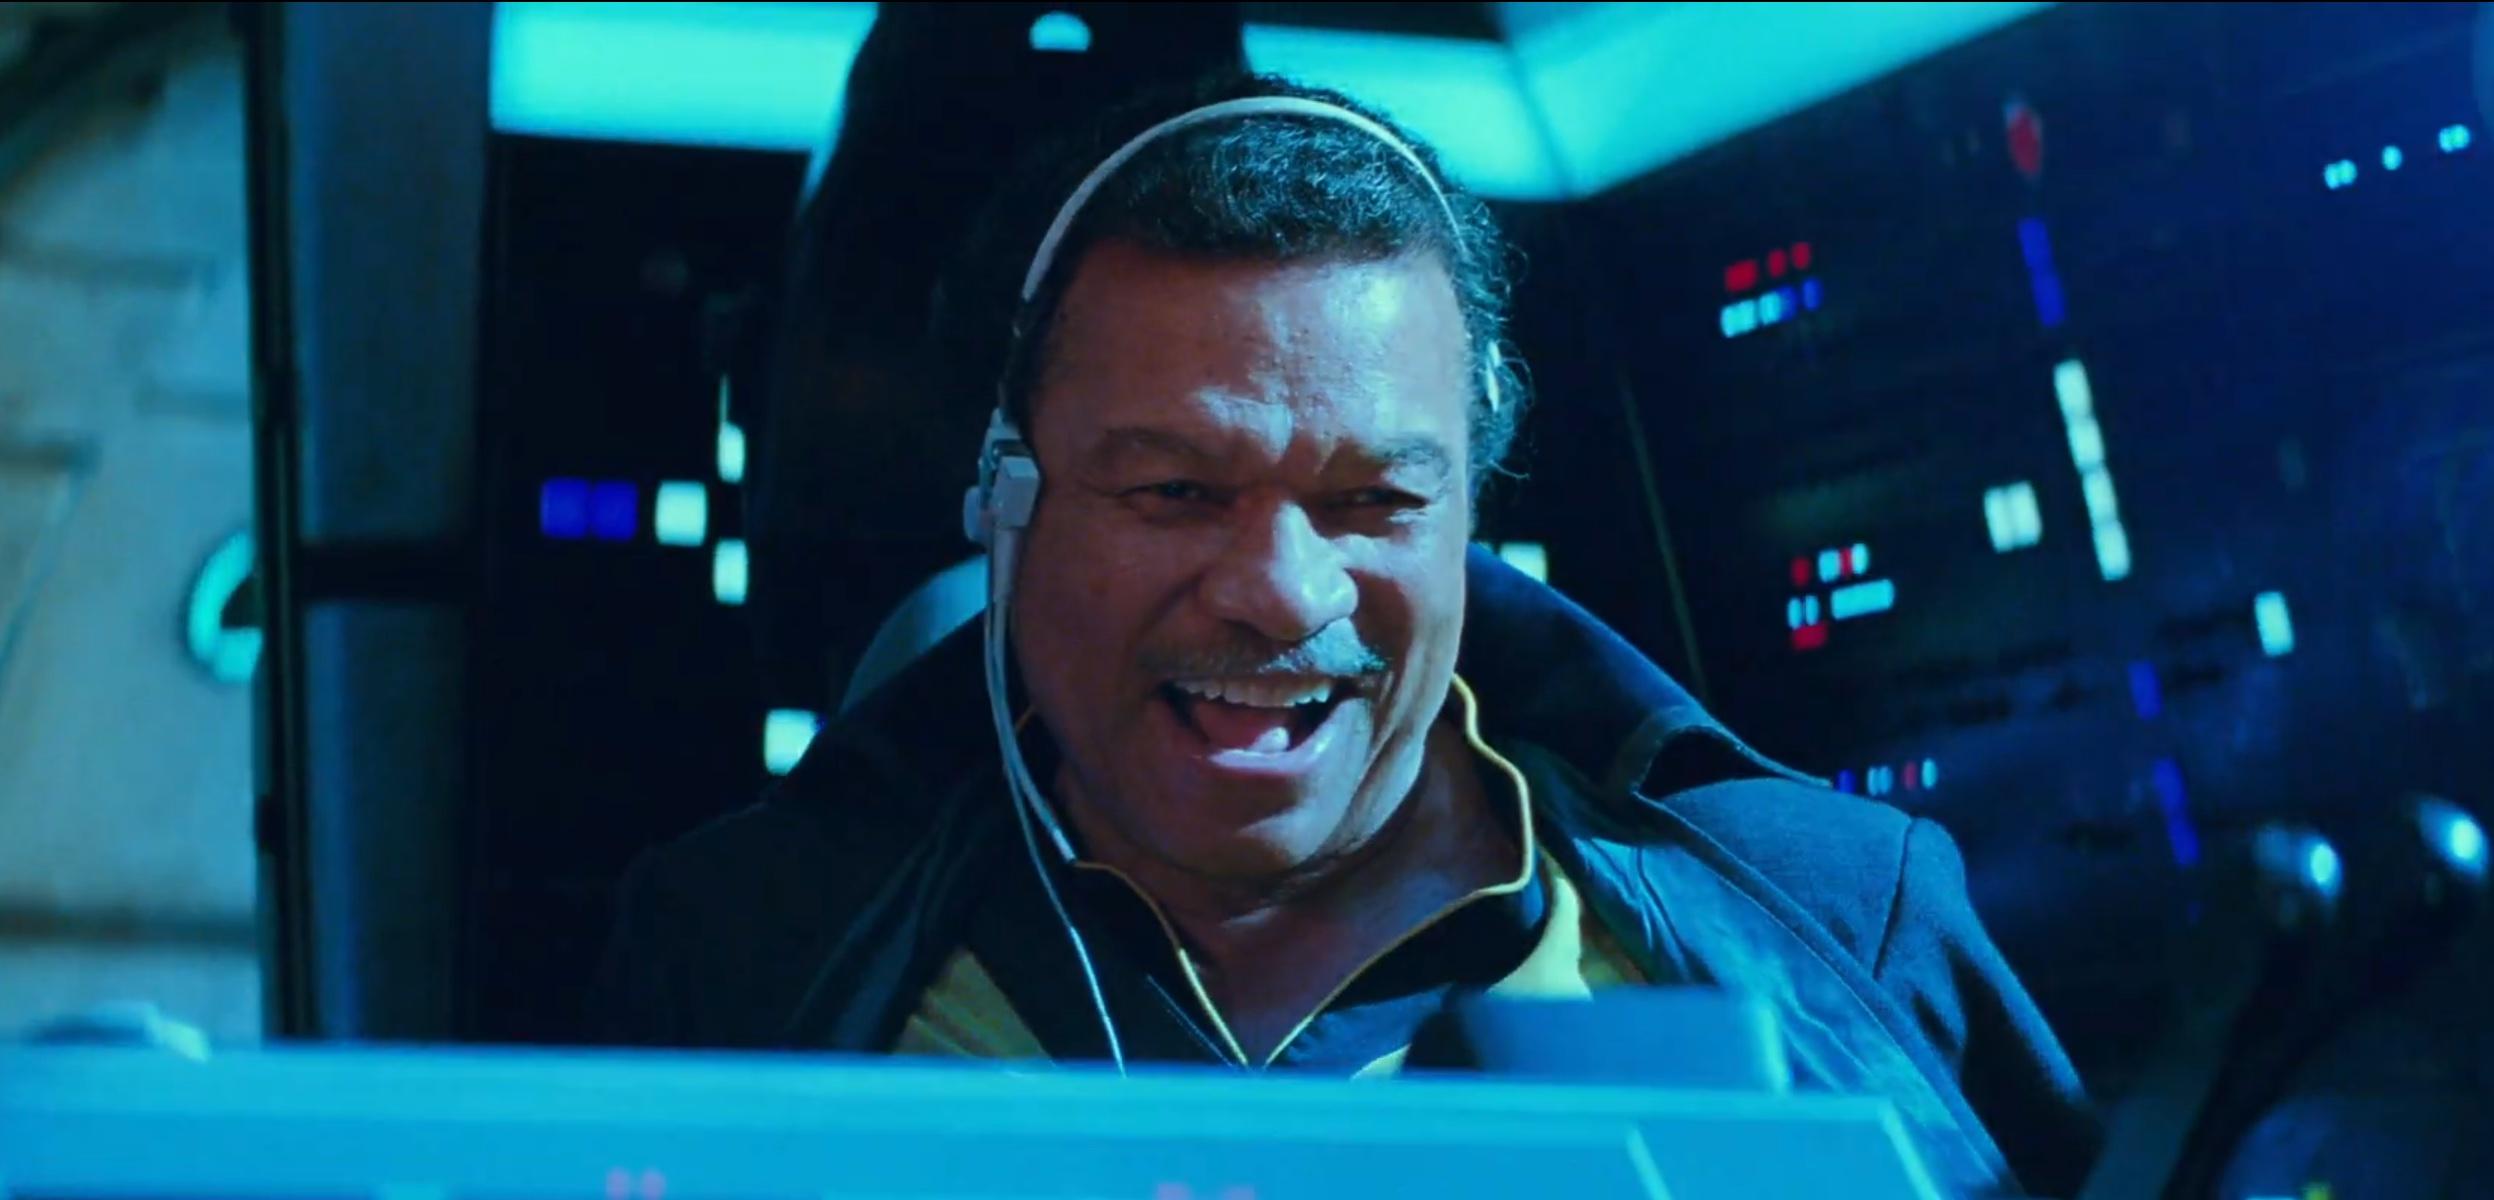 Star Wars: The Rise of Skywalker - Lando Calrissian in un'immagine dal primo teaser